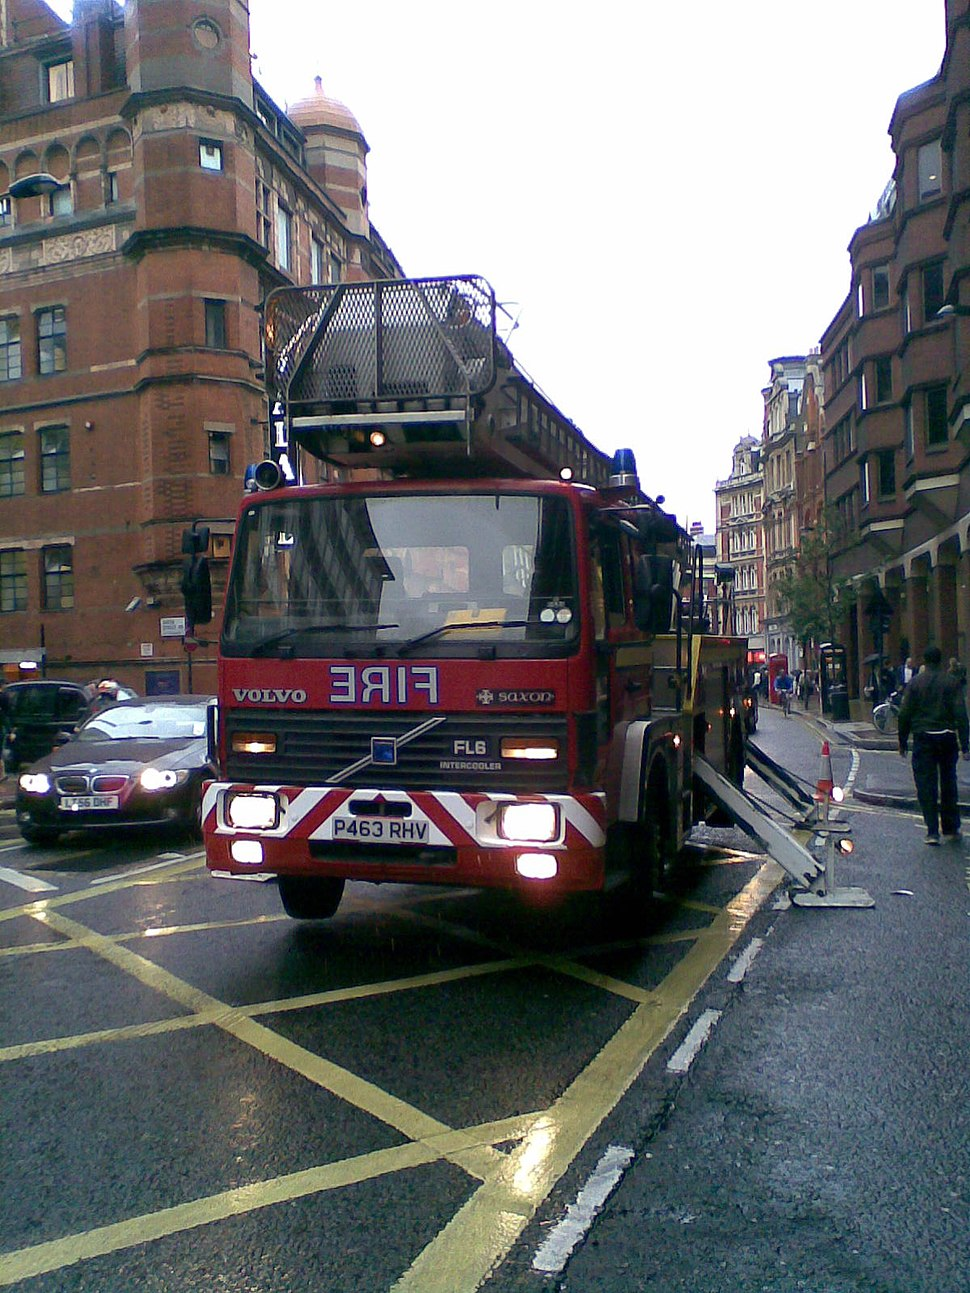 1996 London aerial fire appliance